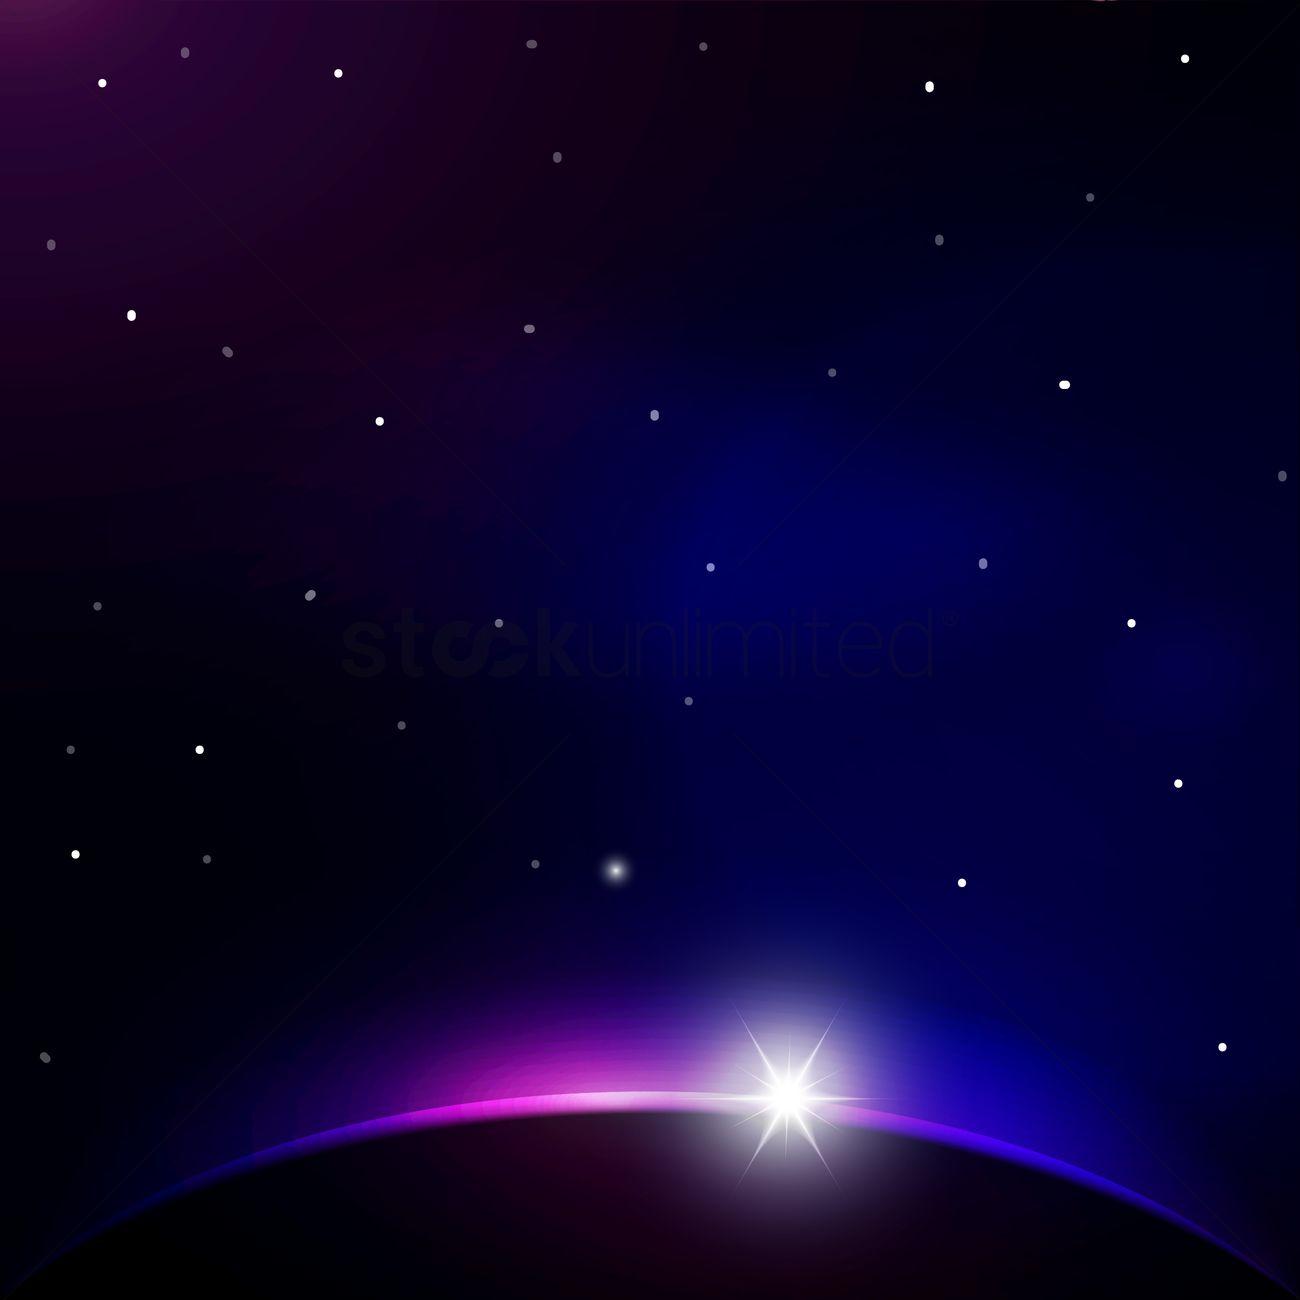 1300x1300 Universe Vector Image